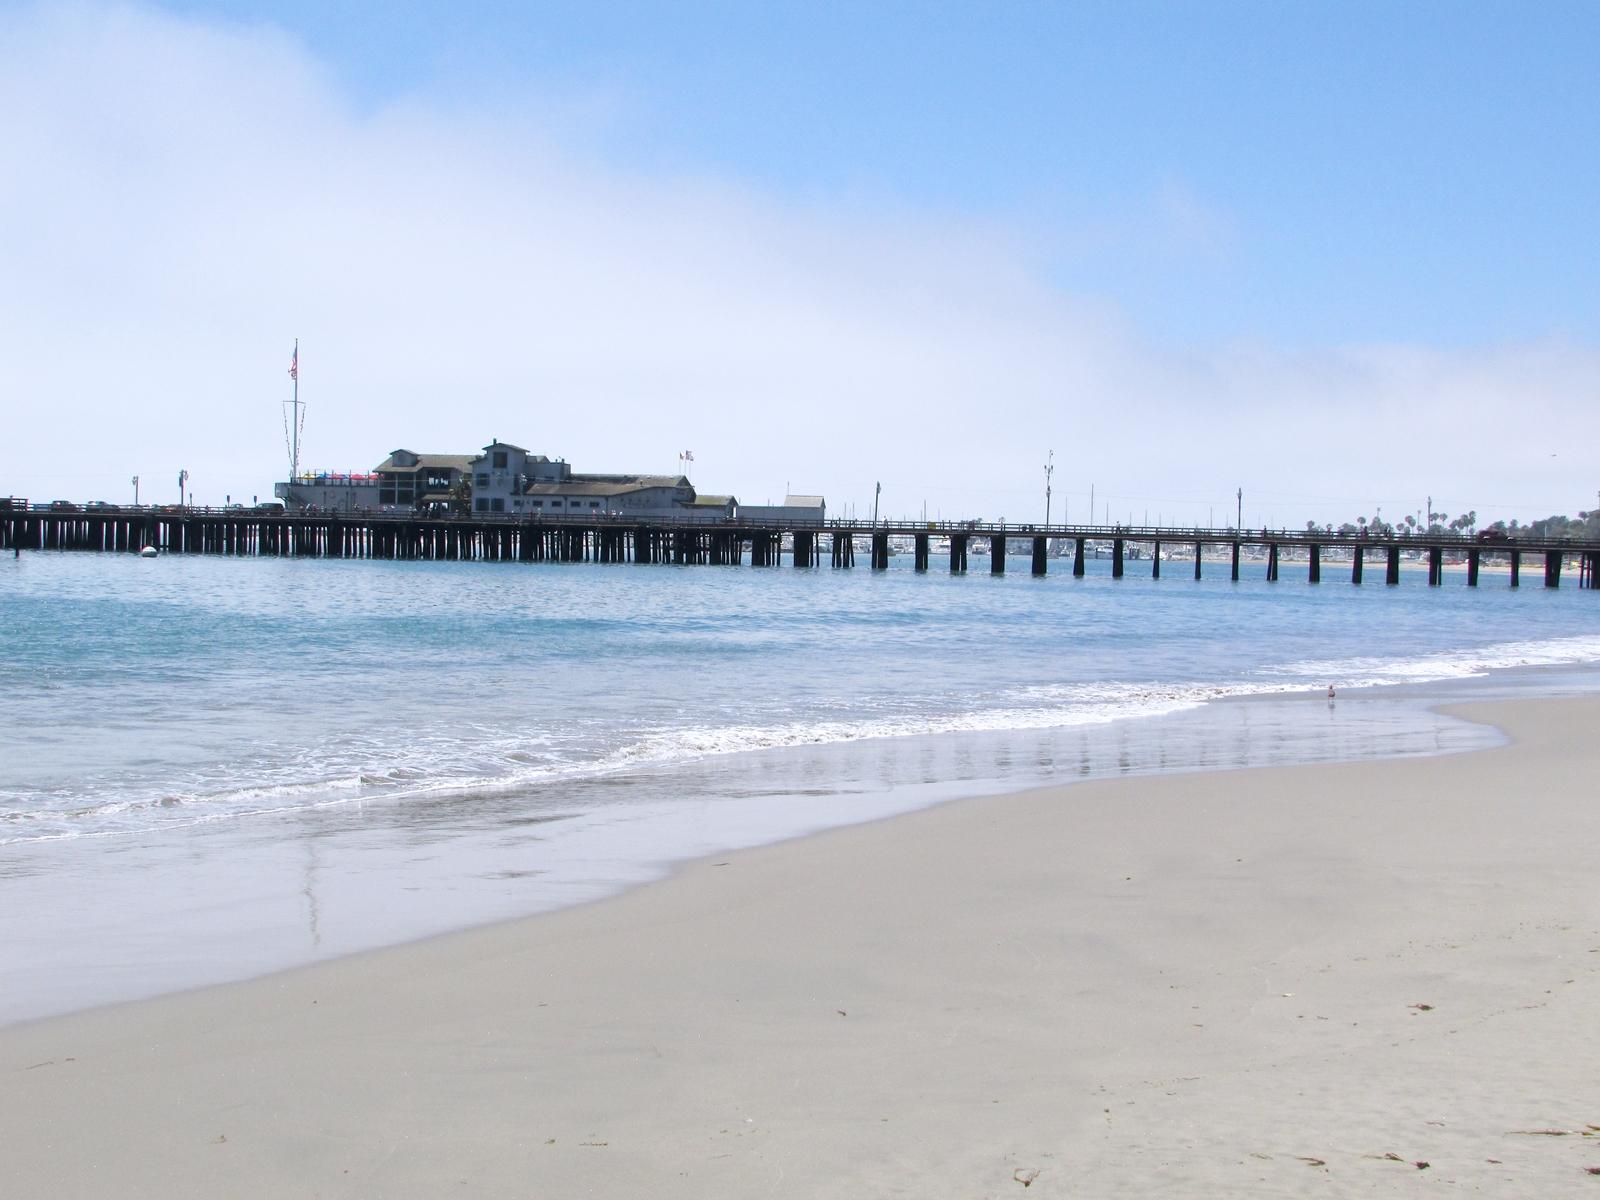 USA Rundreise - Amerika Westküste - Santa Barbara - Strand - Fashionladyloves by Tamara Wagner